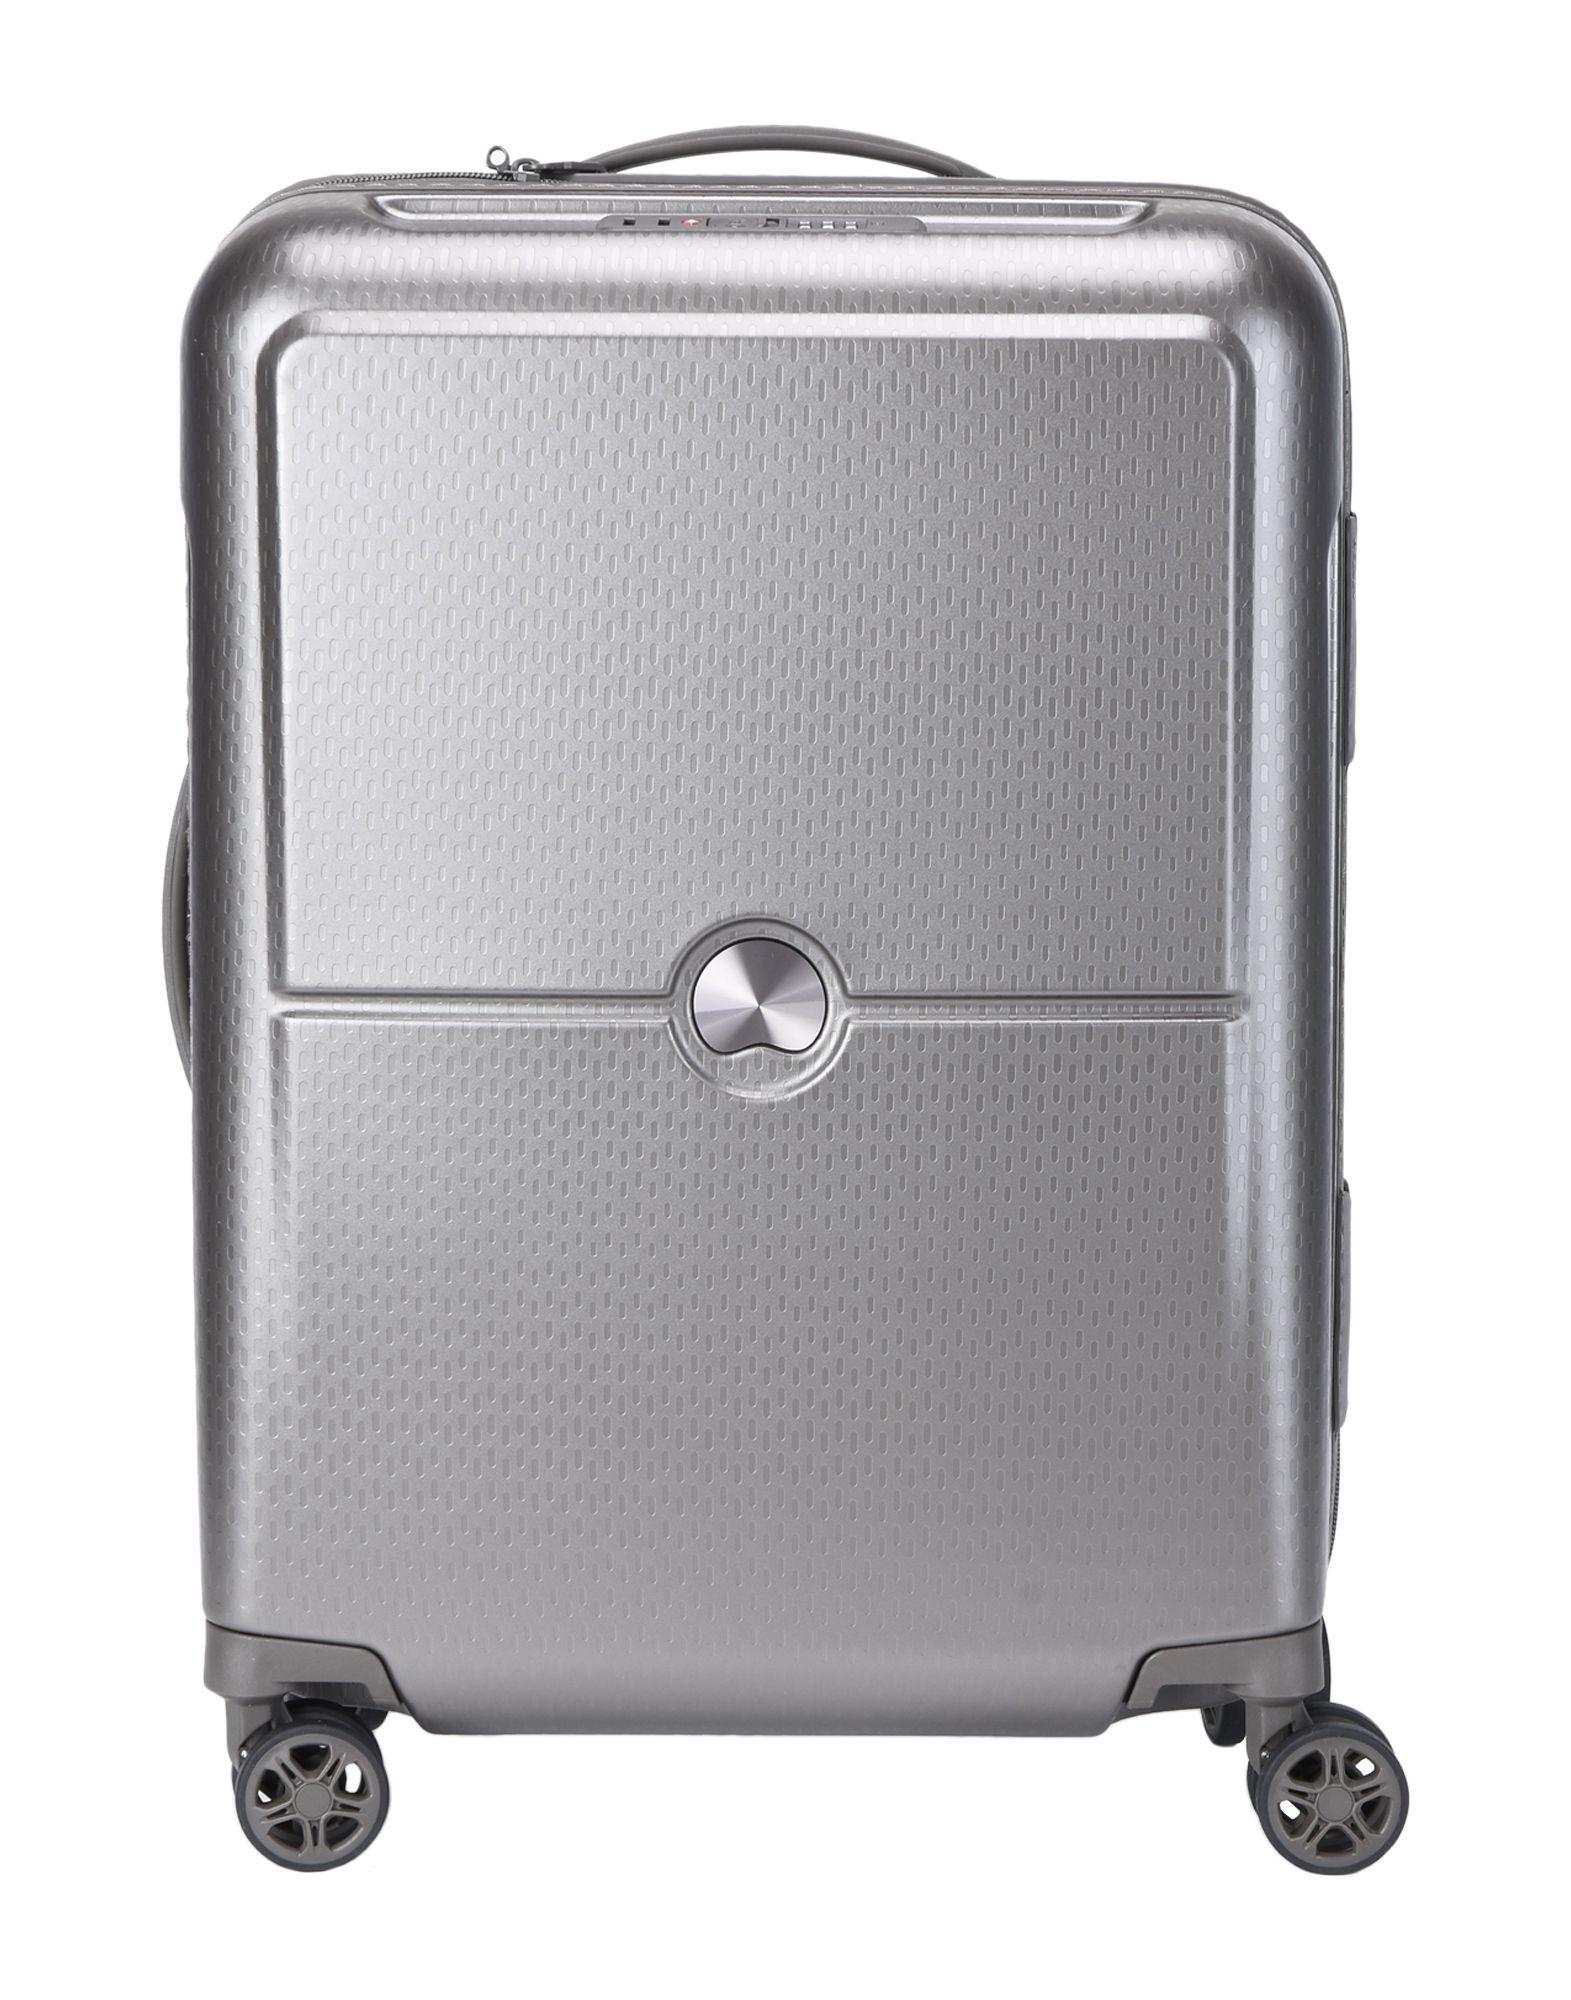 DELSEY Чемодан/сумка на колесиках чемодан для ручной клади delsey ison 3576801 3576801 02